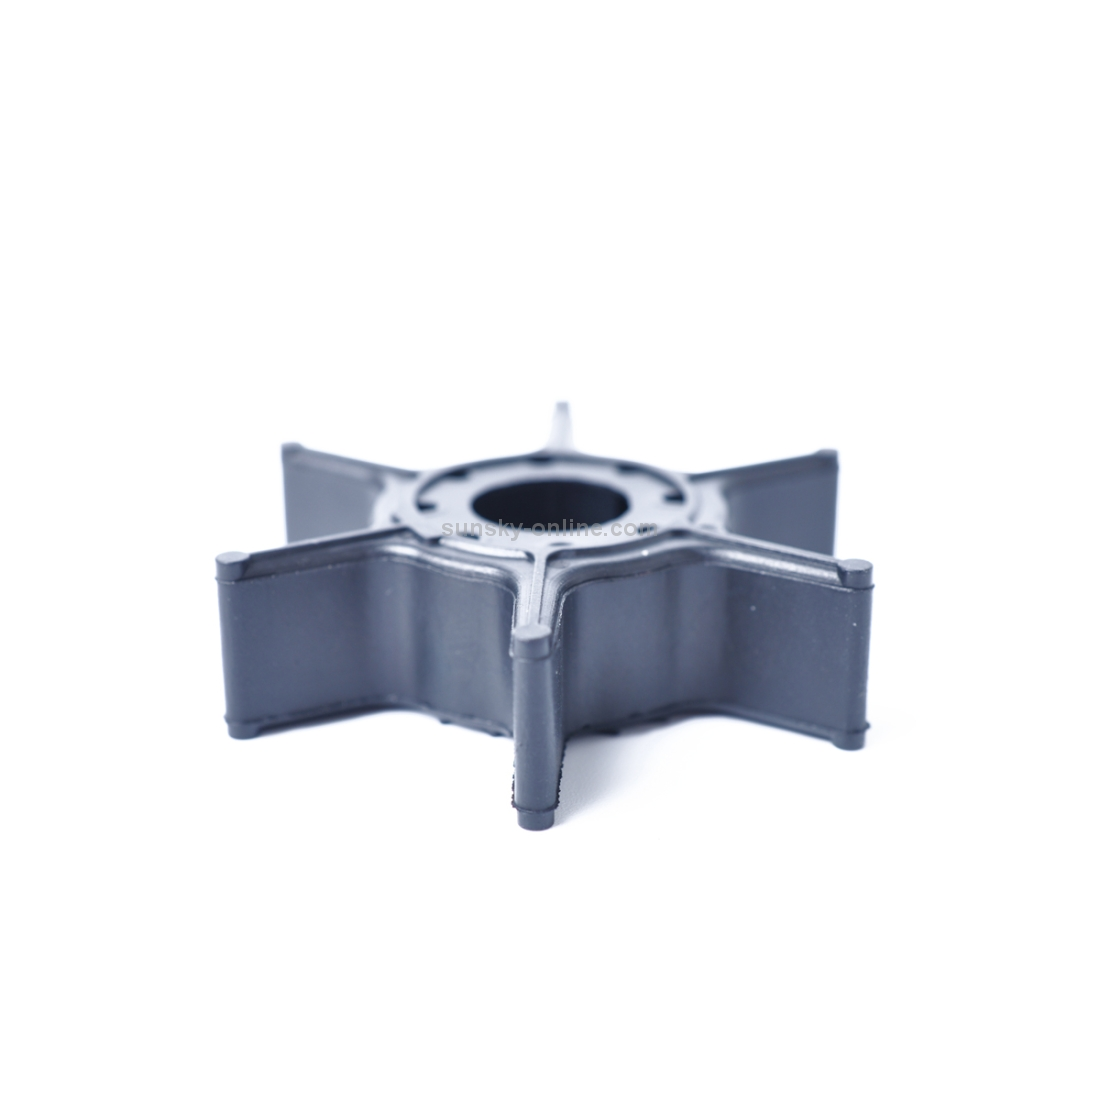 SUNSKY - Water Pump Impeller for Yamaha 8HP 9 9HP 15HP 20HP